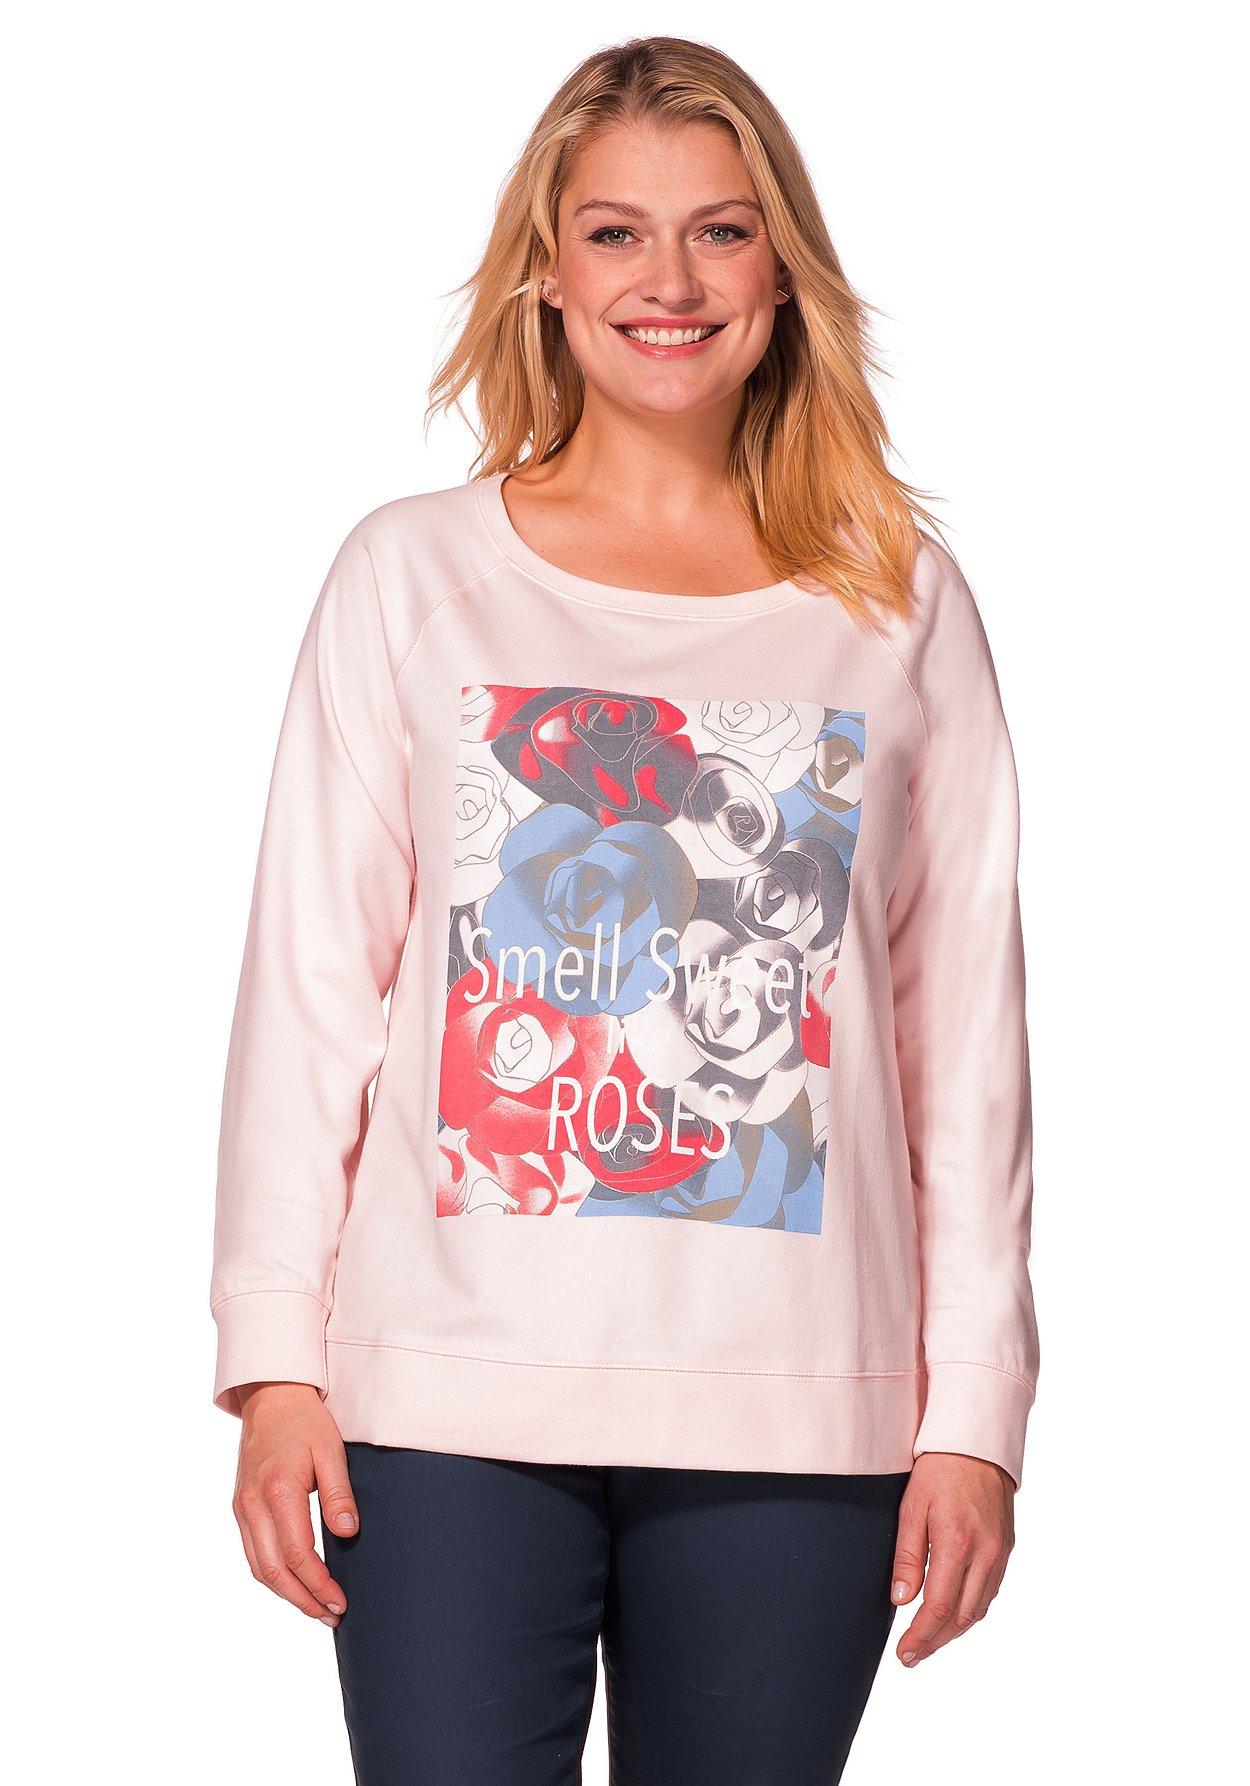 sheego damen sweatshirt shirt langarm top oberteil. Black Bedroom Furniture Sets. Home Design Ideas